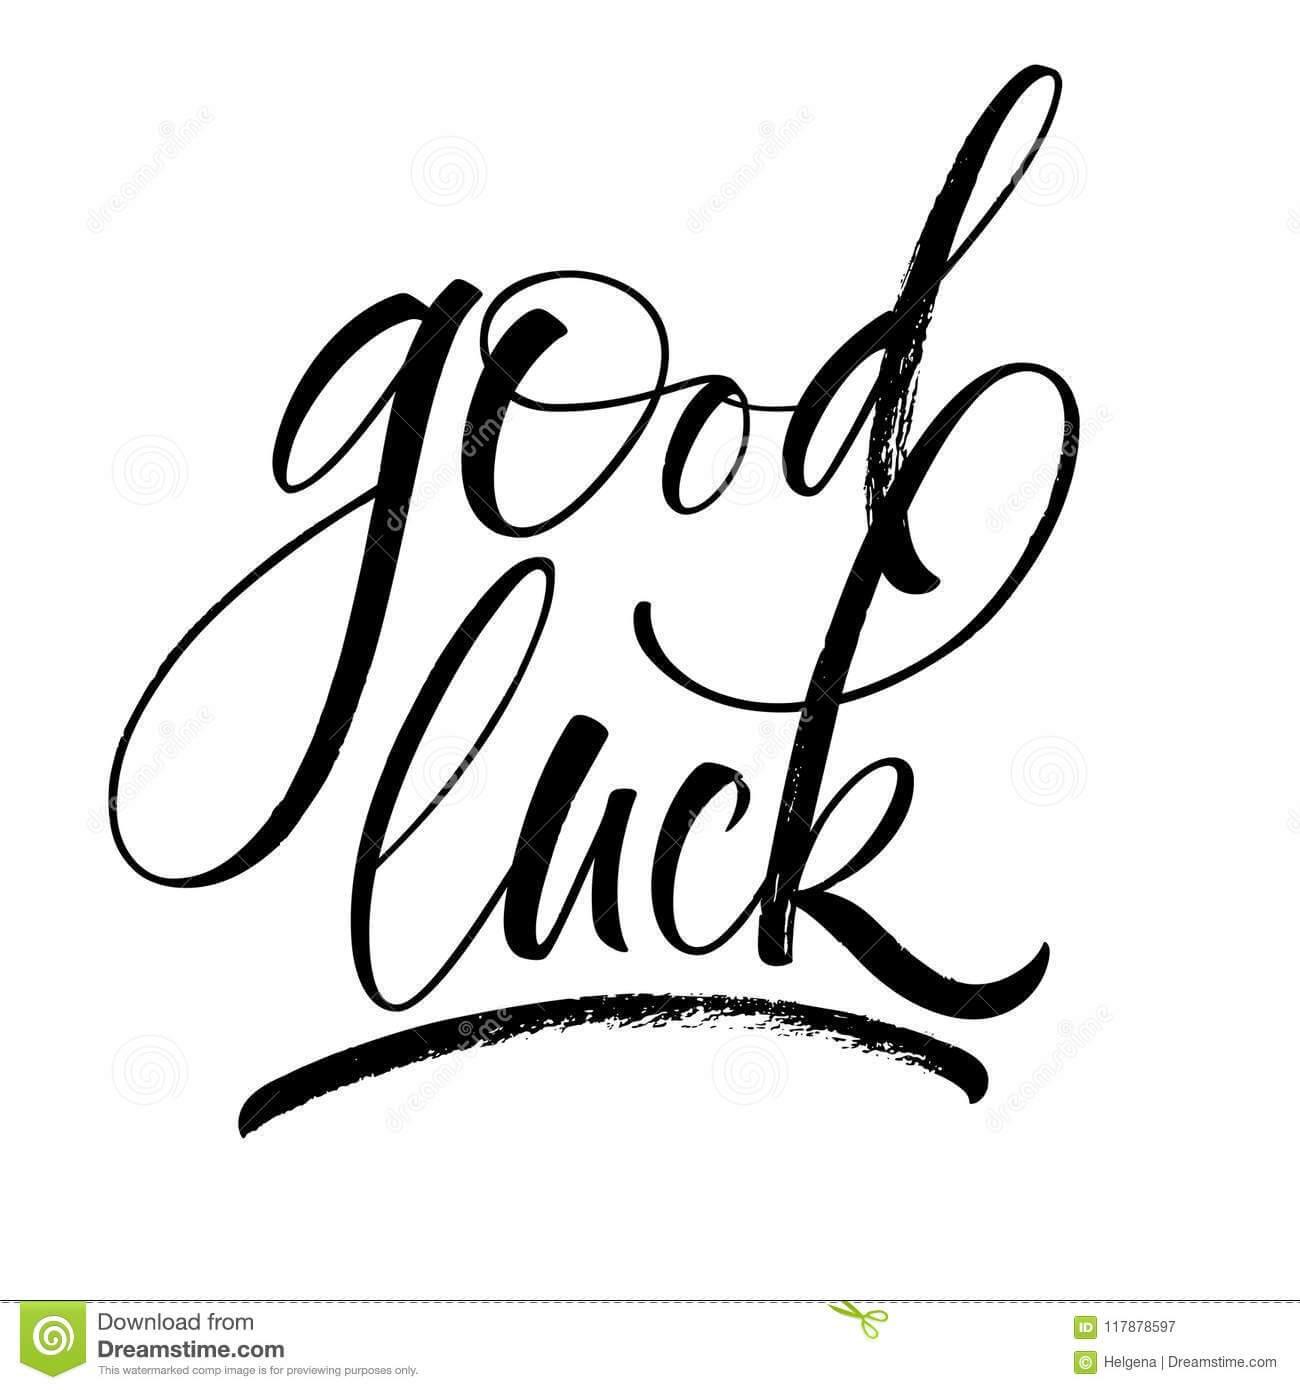 Good Luck Lettering Stock Vector. Illustration Of Goodbye In Good Luck Banner Template